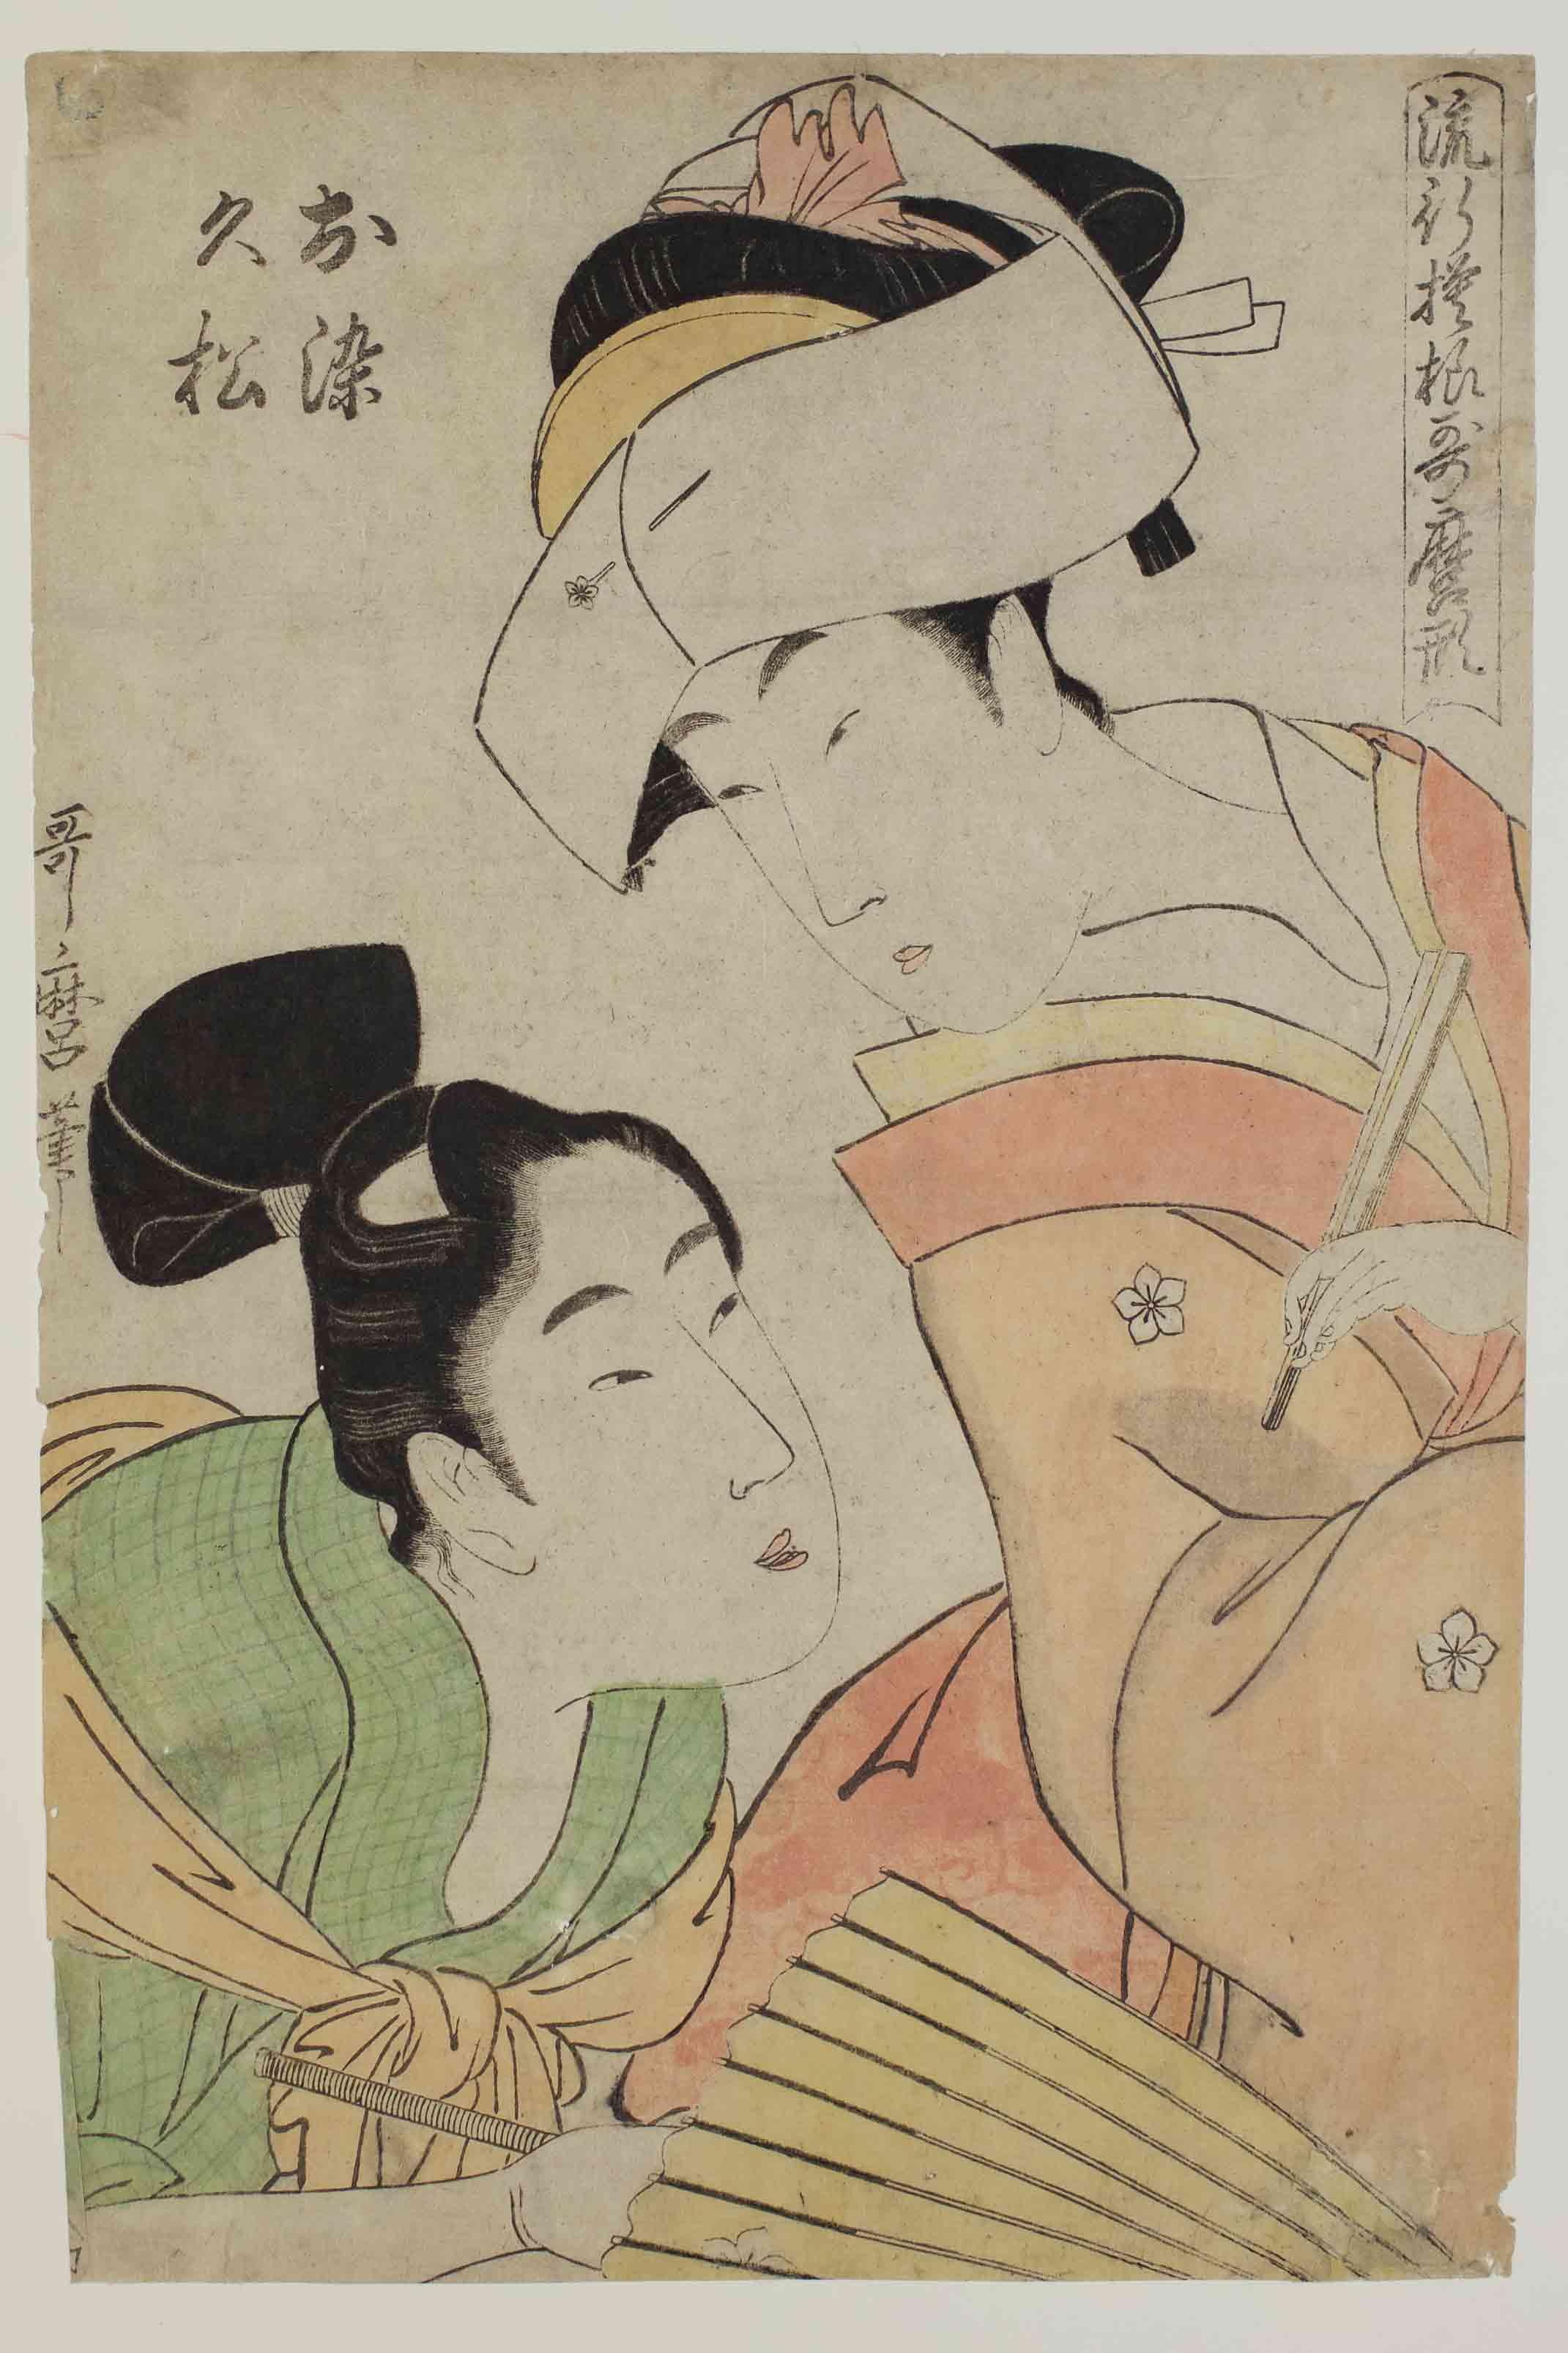 Kitagawa Utamaro  Elegant People in Utamaro style, 1801 ca